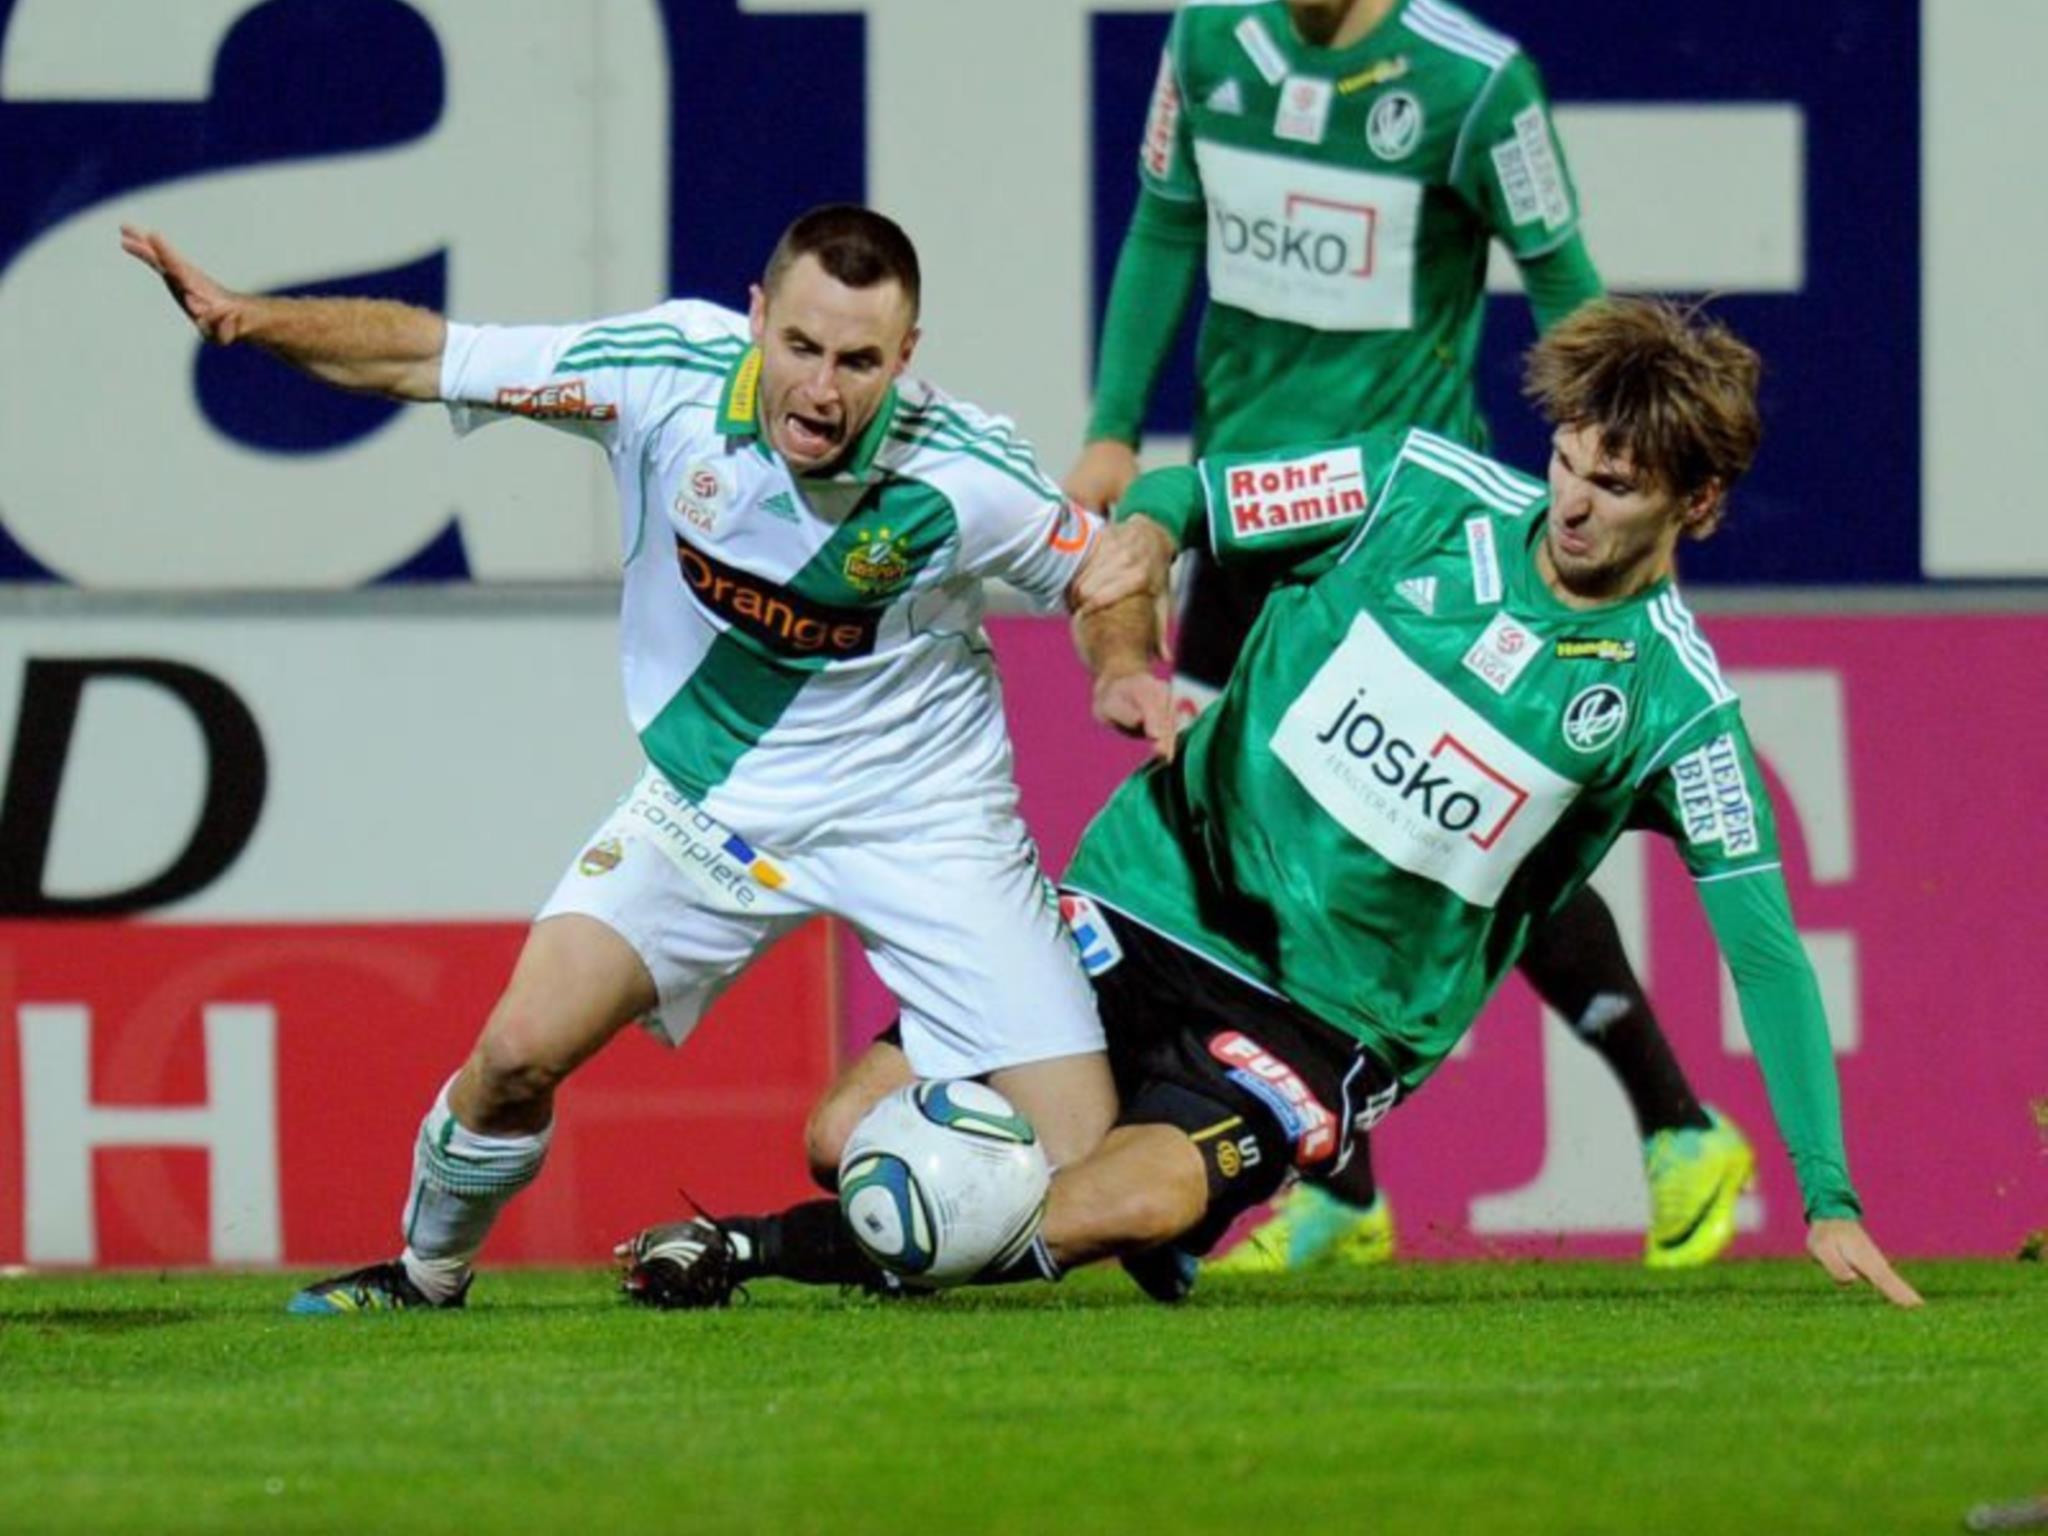 Tabellenführer Rapid Wien empfängt heute zum Auftakt den SV Ried